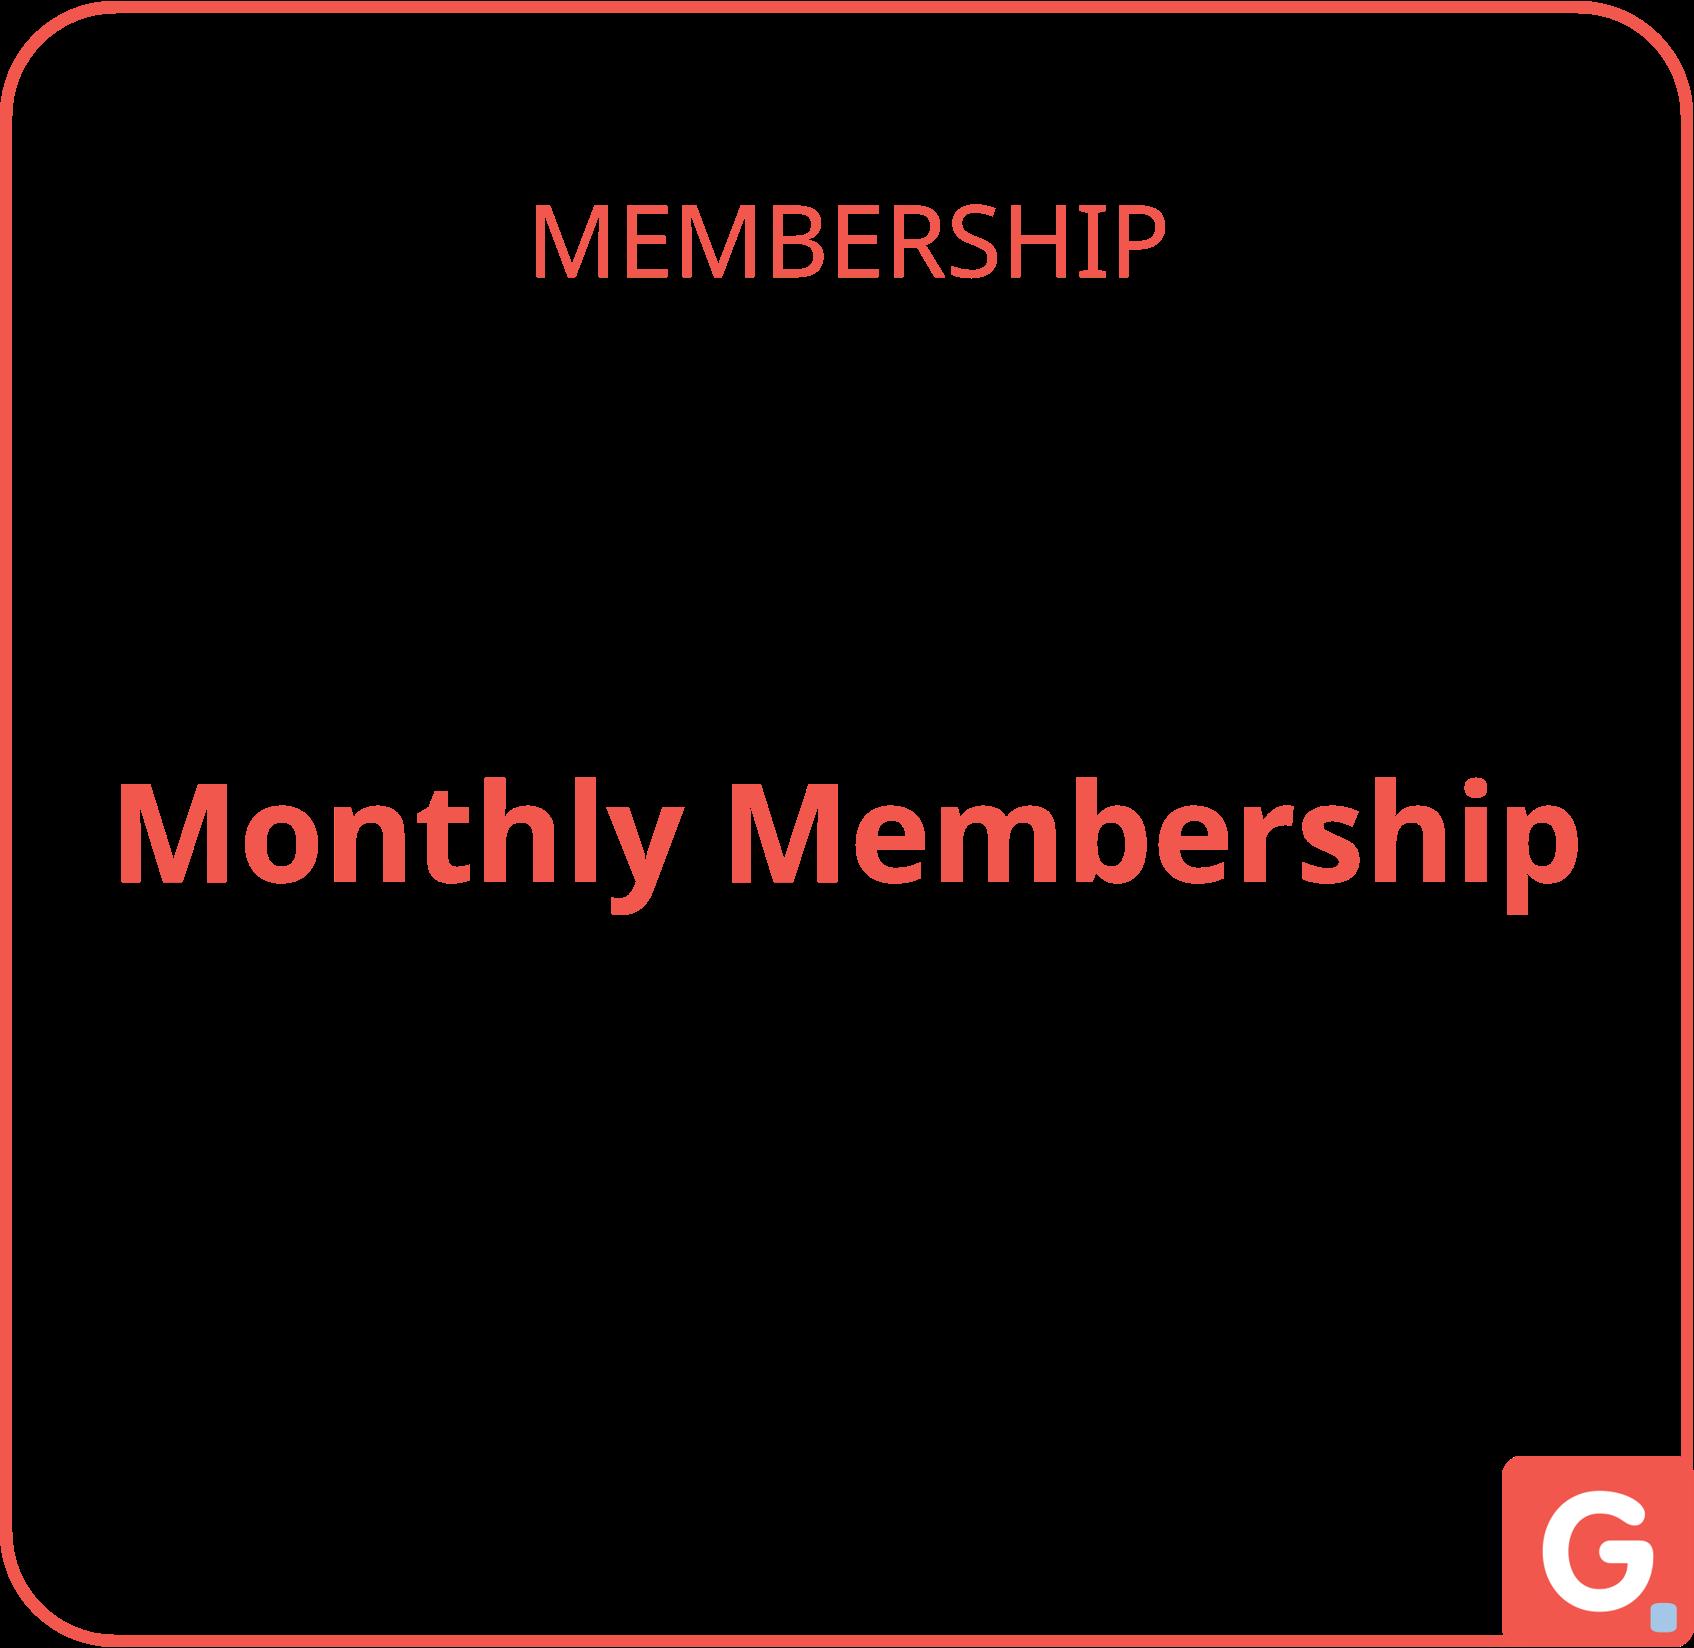 MONTHLY MEMBERSHIP | Gpl.ONE